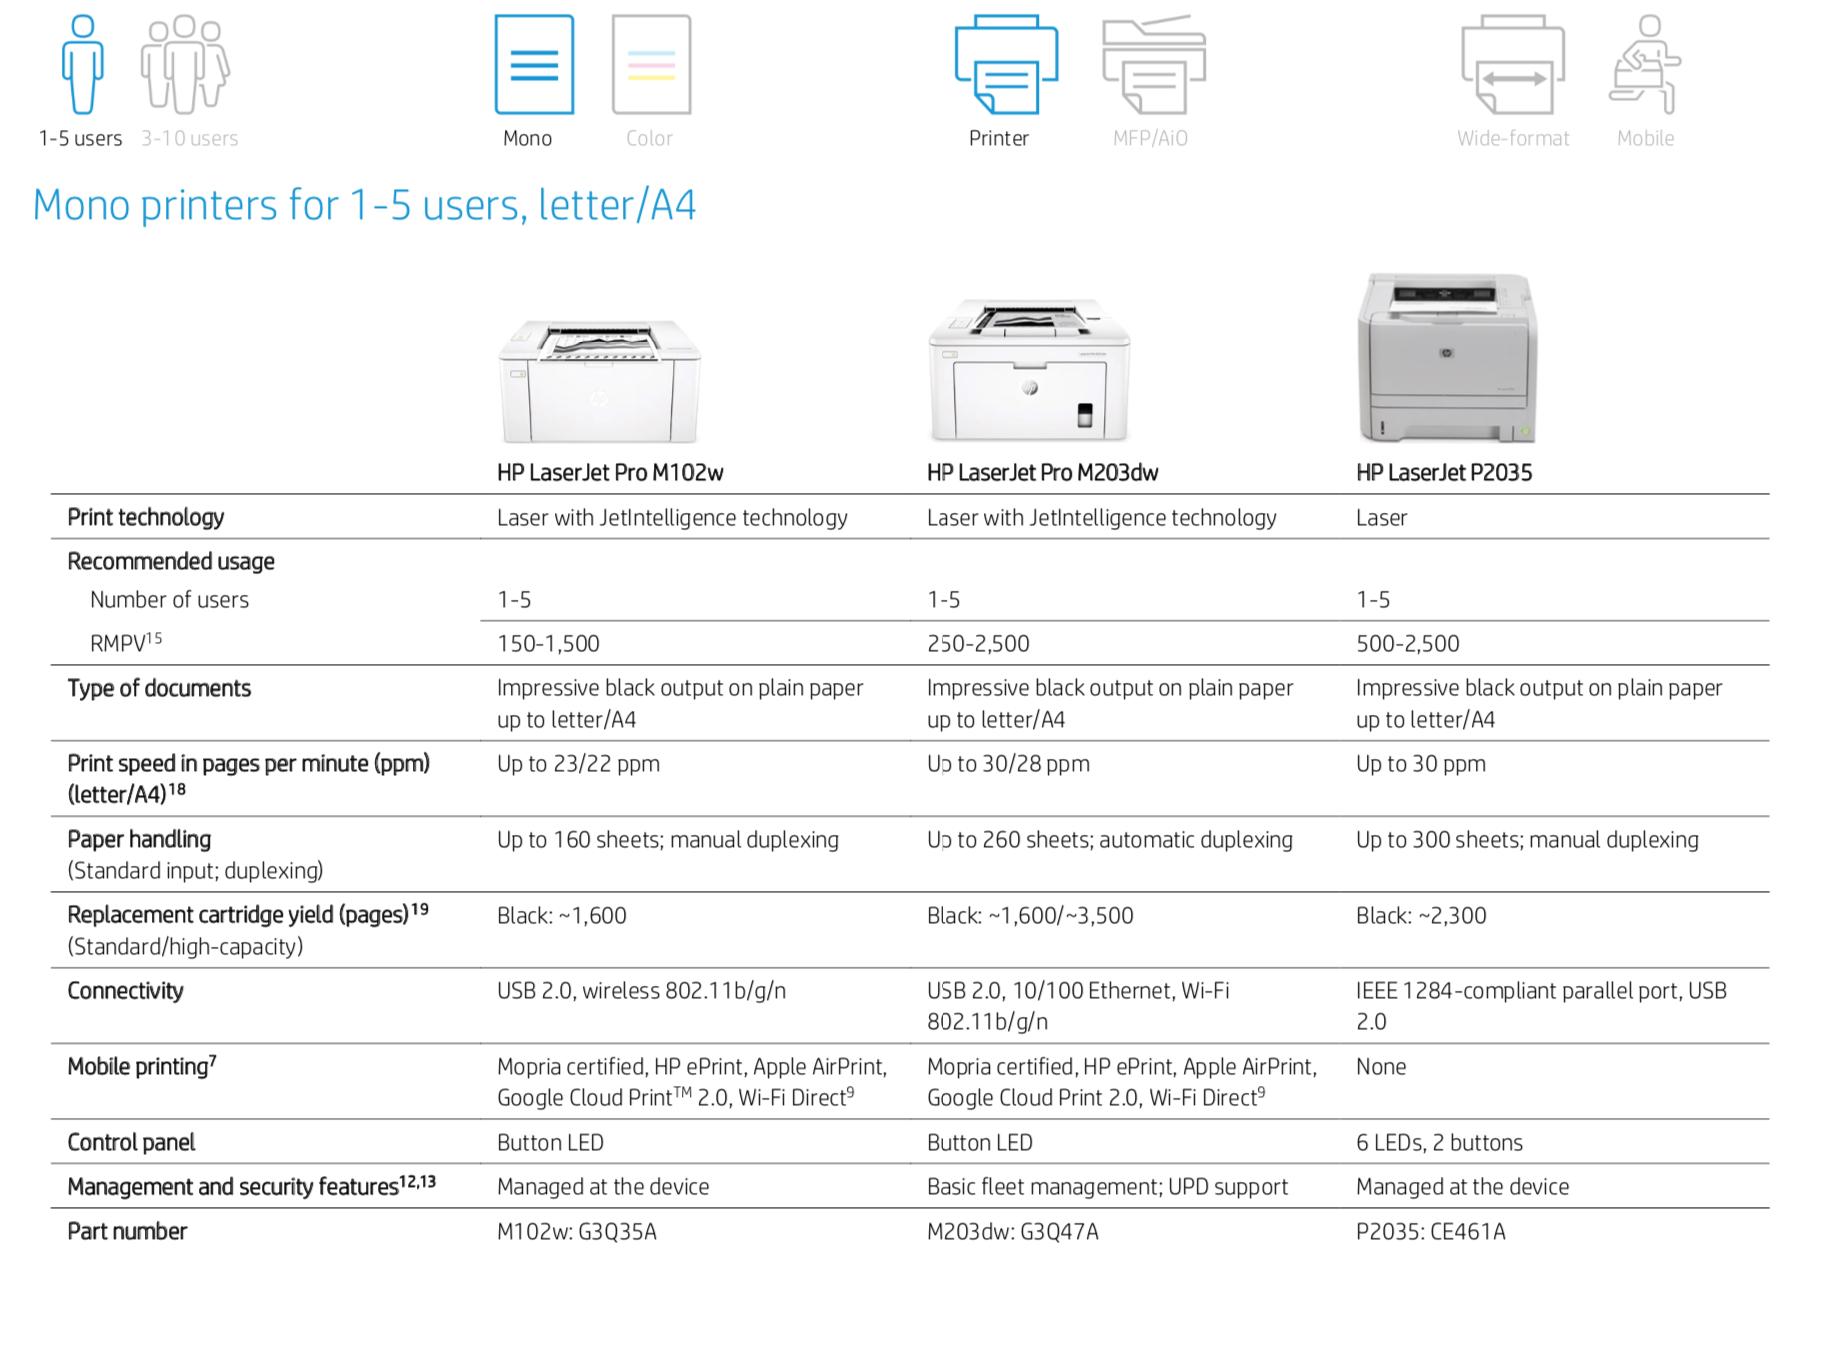 Mono printers for 1-5 users